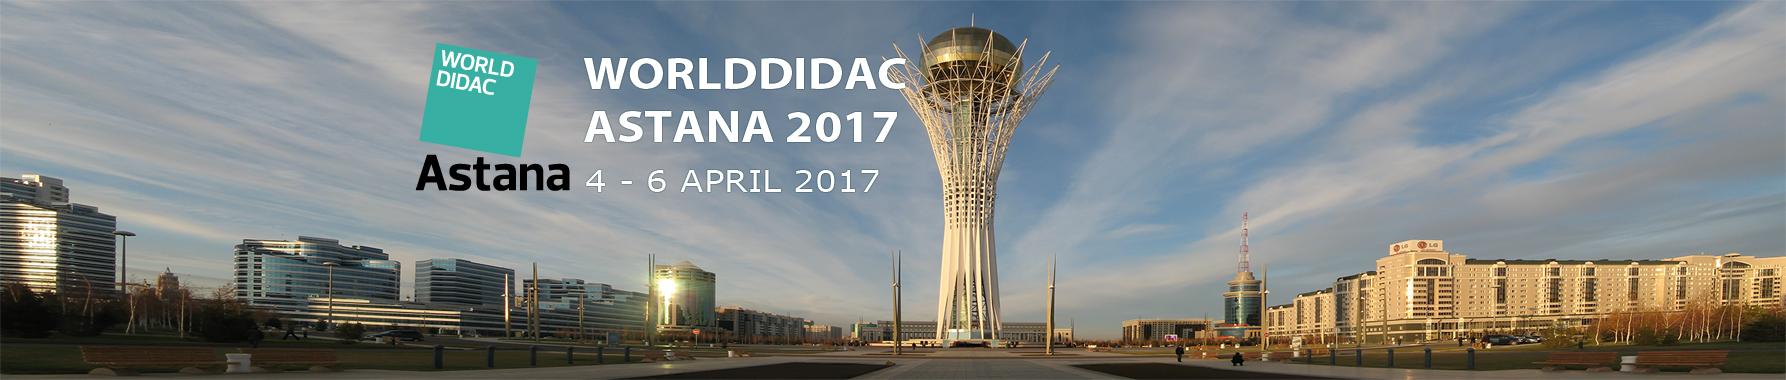 Worlddidac-astana-kazhakistan-2017-event-banner-exhibition